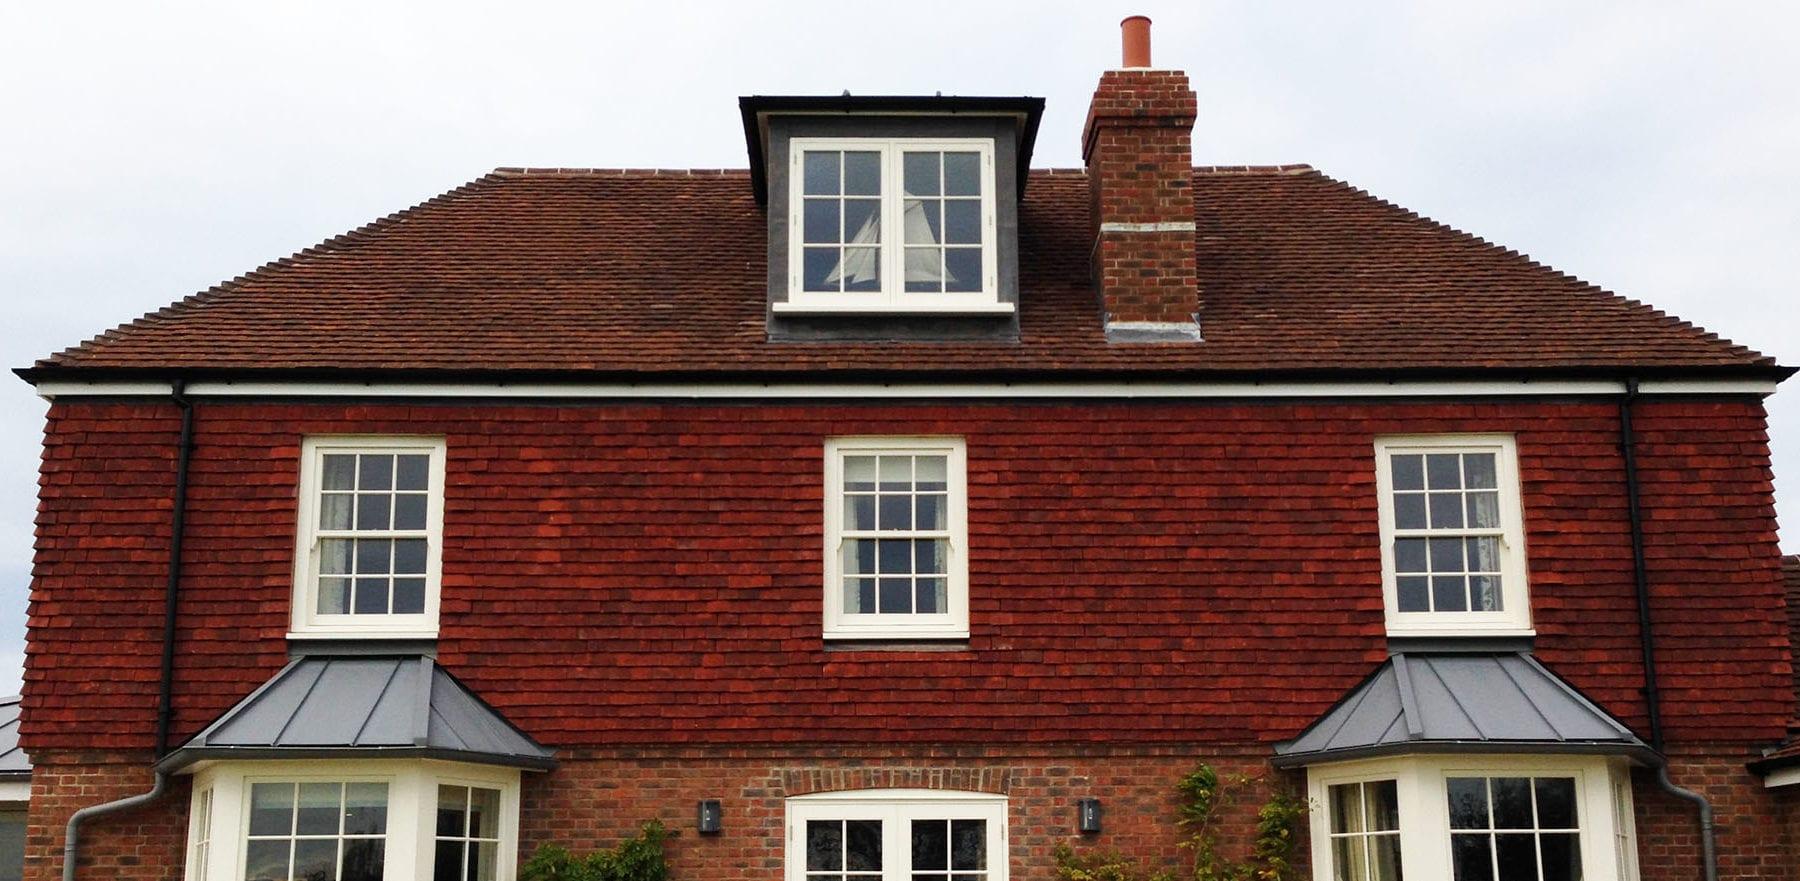 Lifestiles - Handmade Restoration Clay Roof Tiles - Chidham, England 5